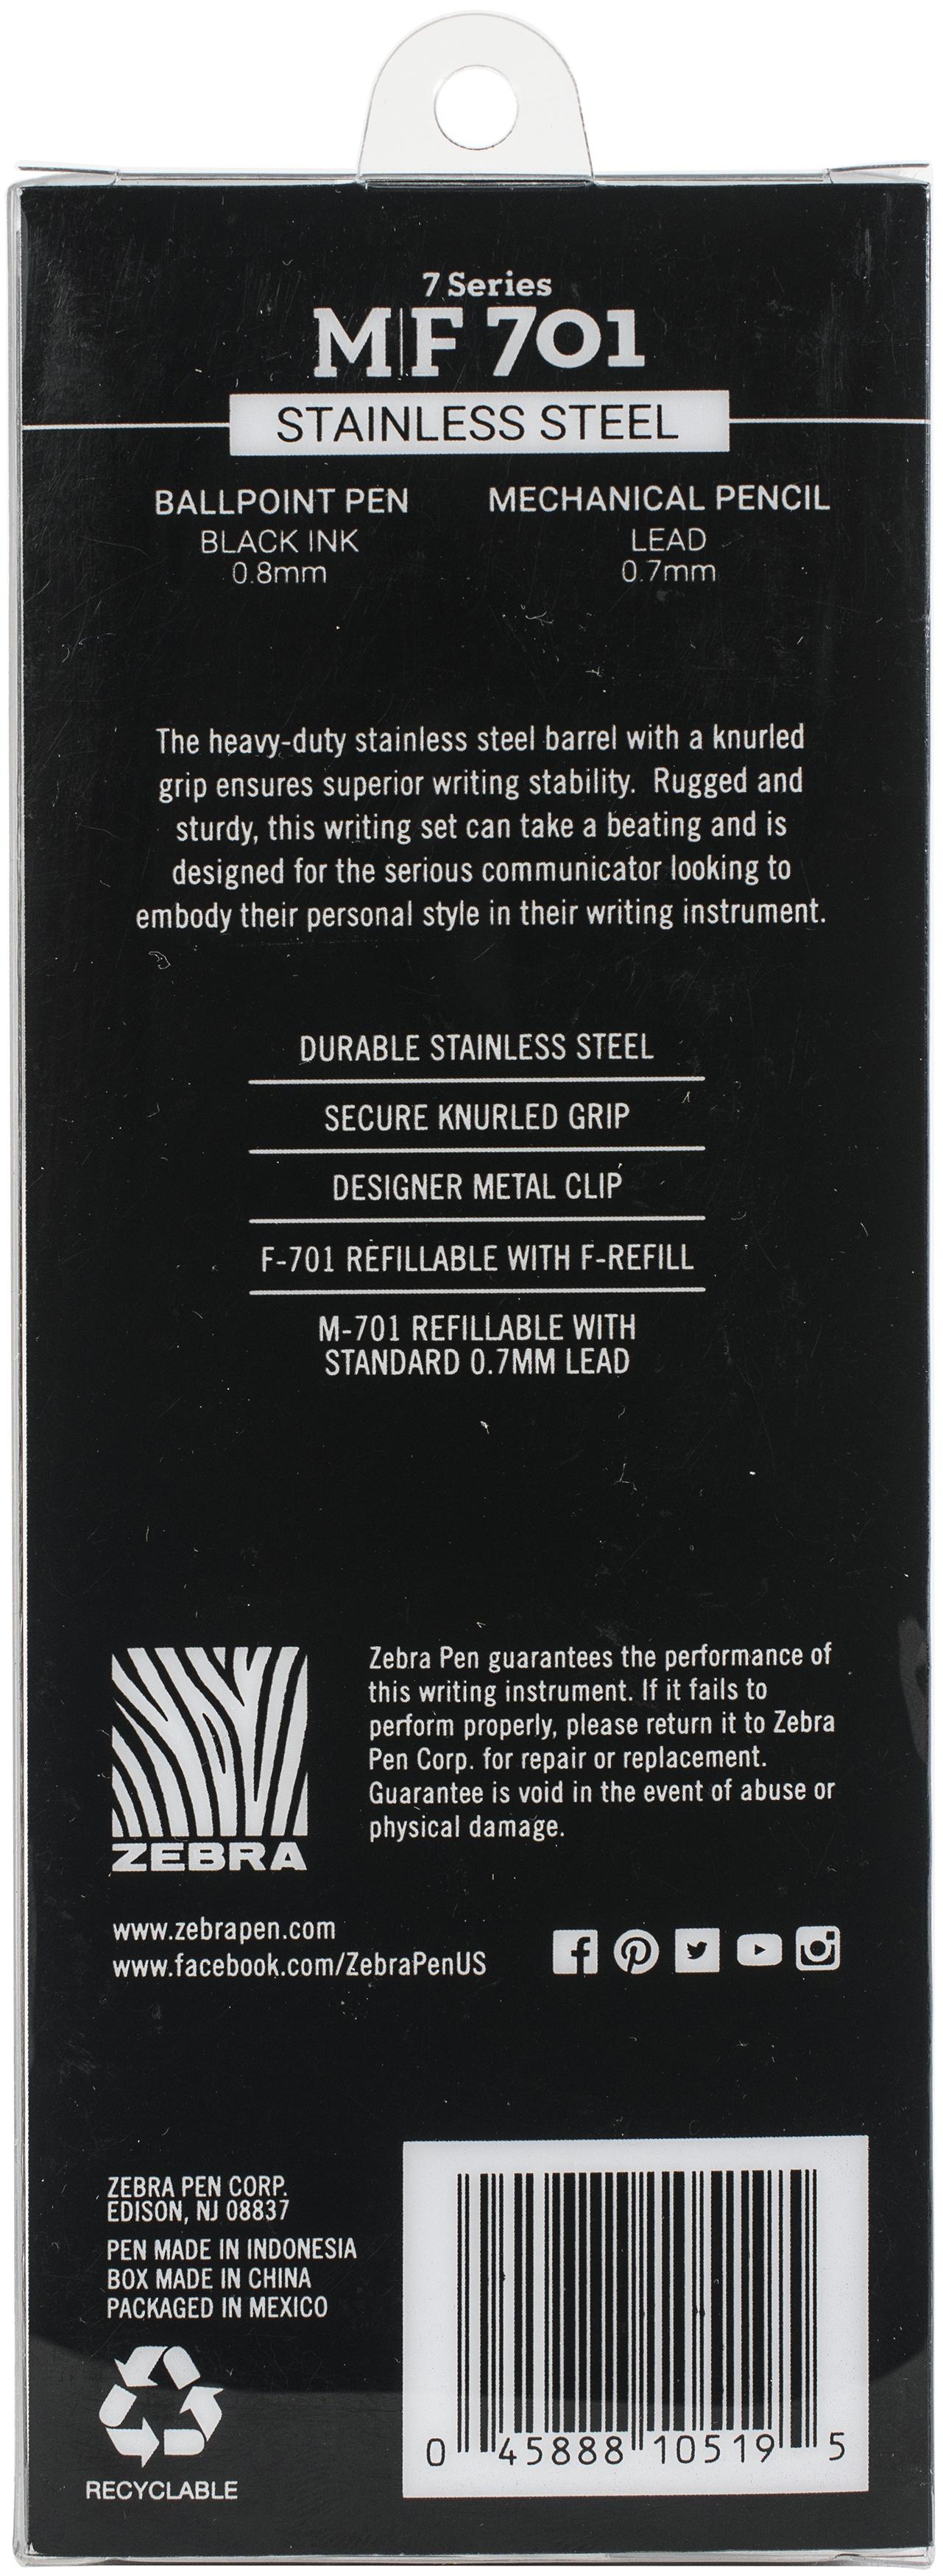 Zebra M/F 701 Stainless Steel Pen & Pencil Gift Set 2/Pkg-Pen 0.8mm & Mechanical Pencil 0.7mm